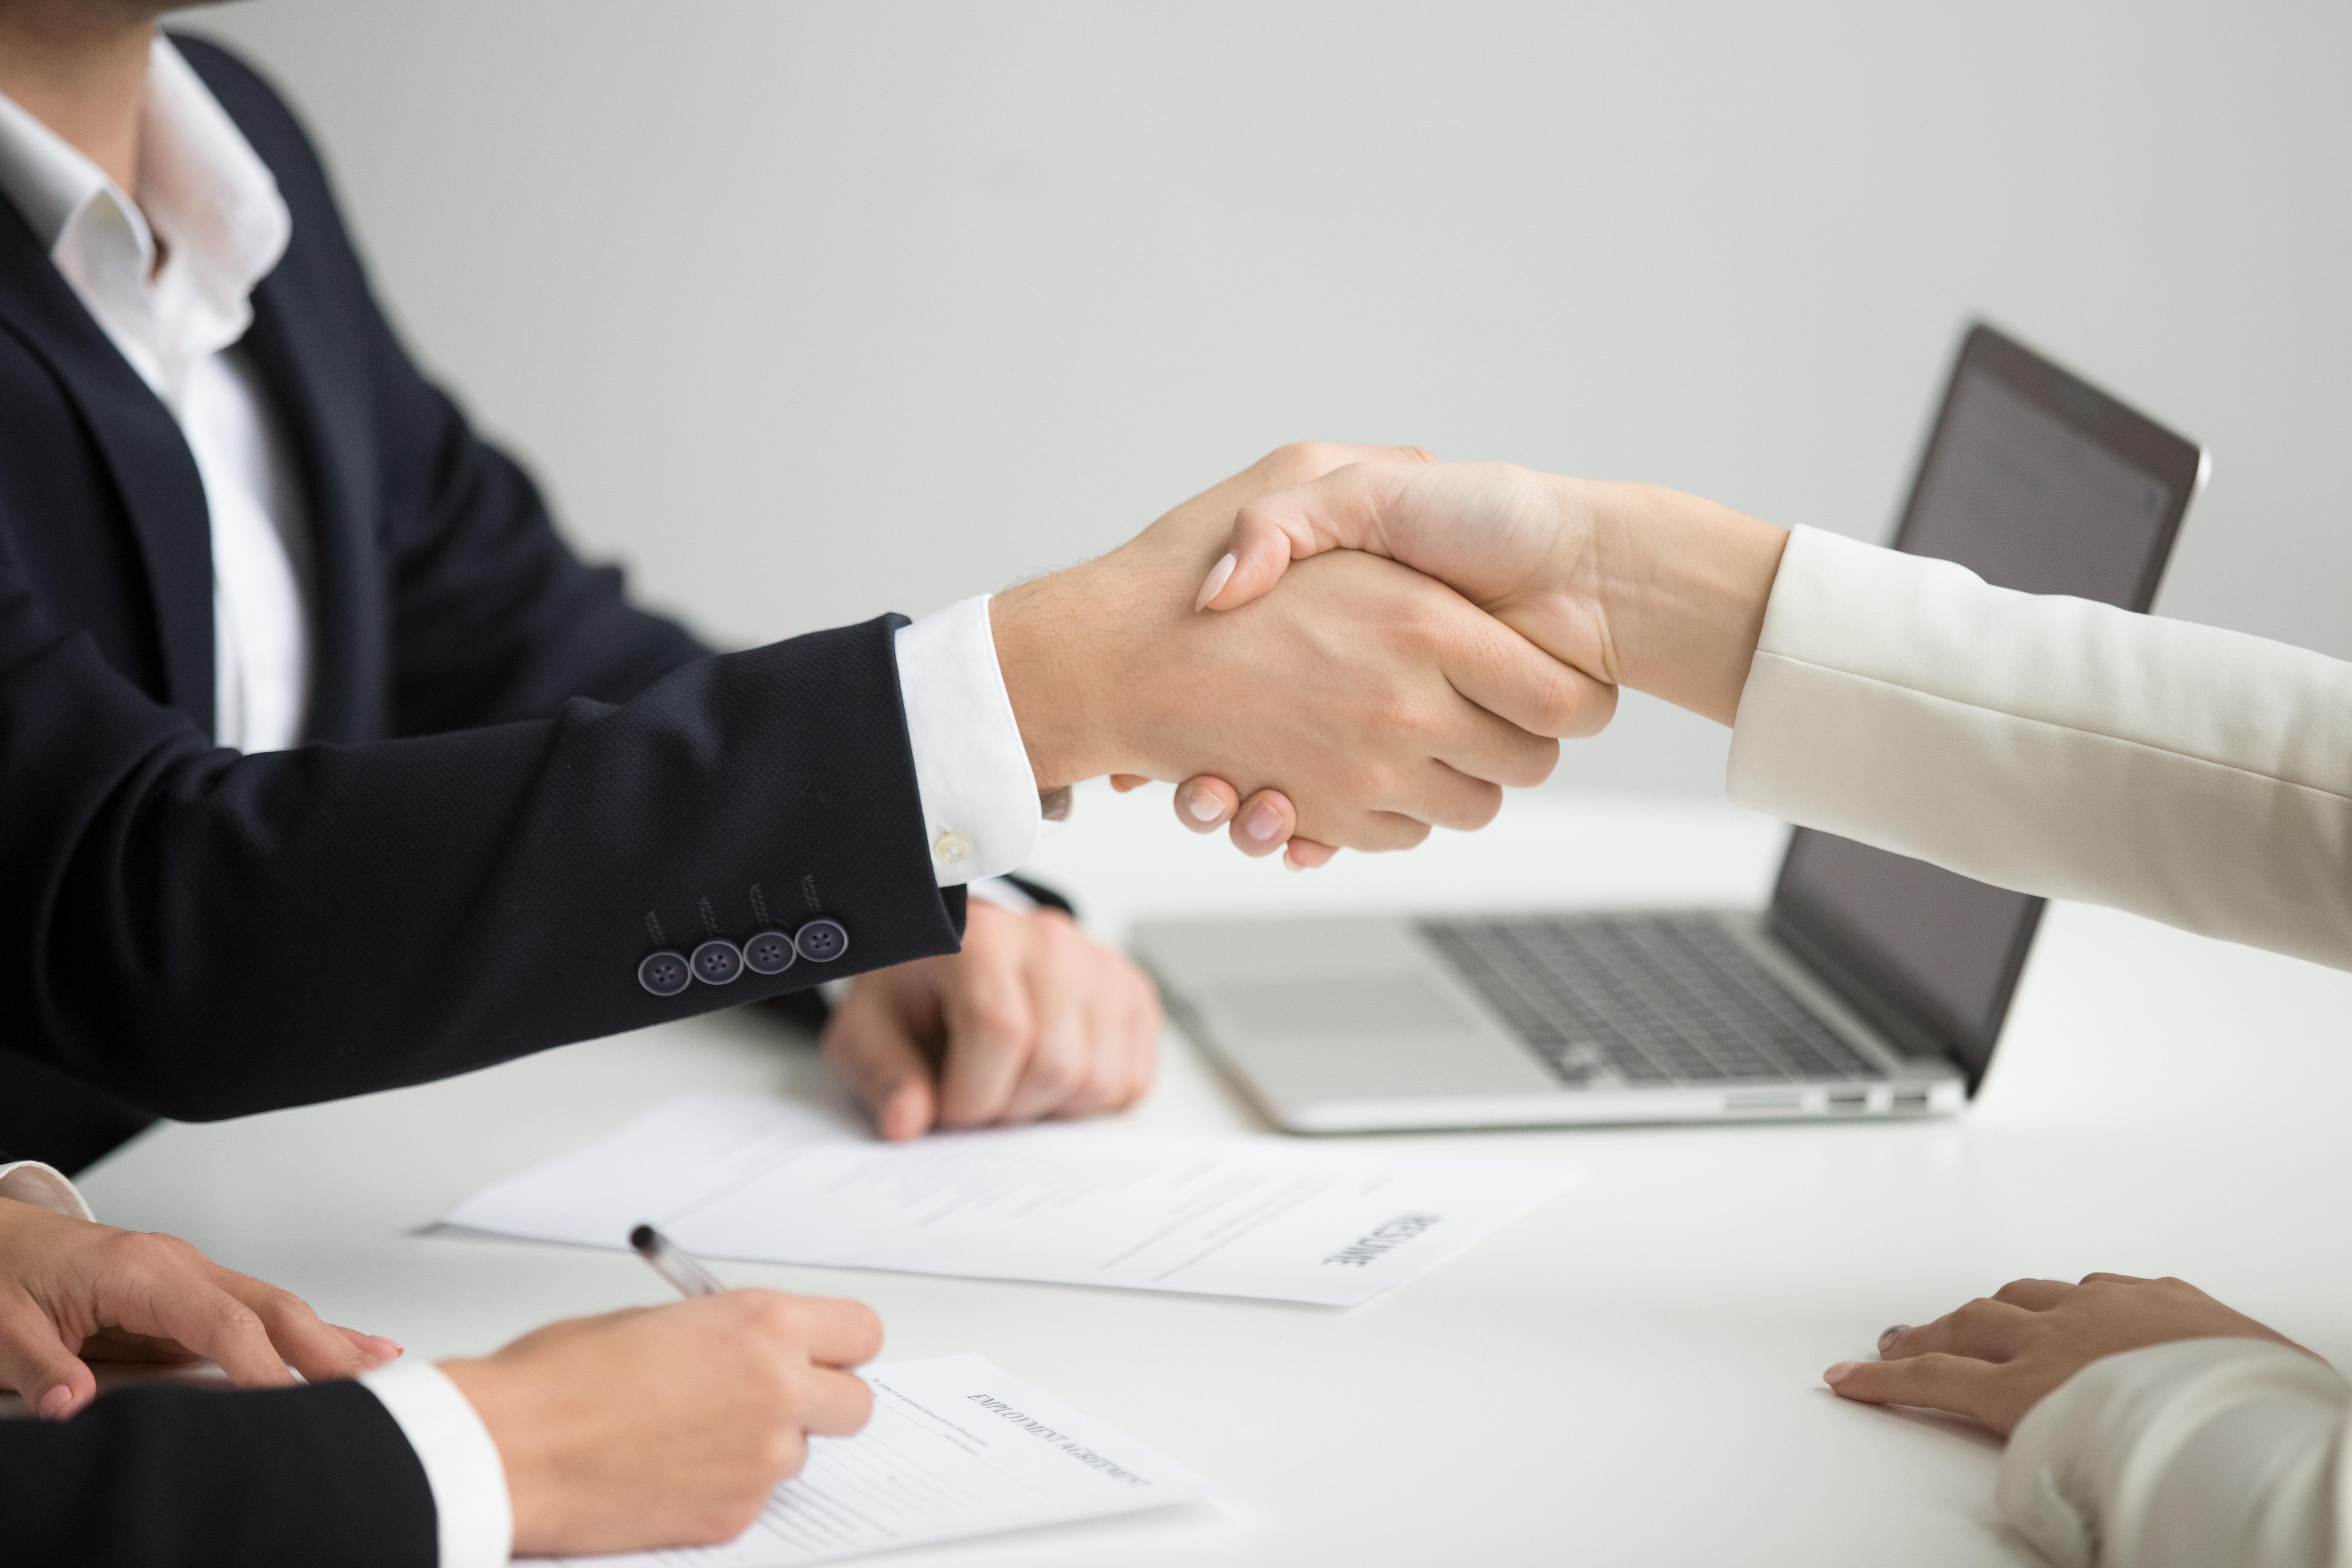 Handschlag Geschäftstreffen